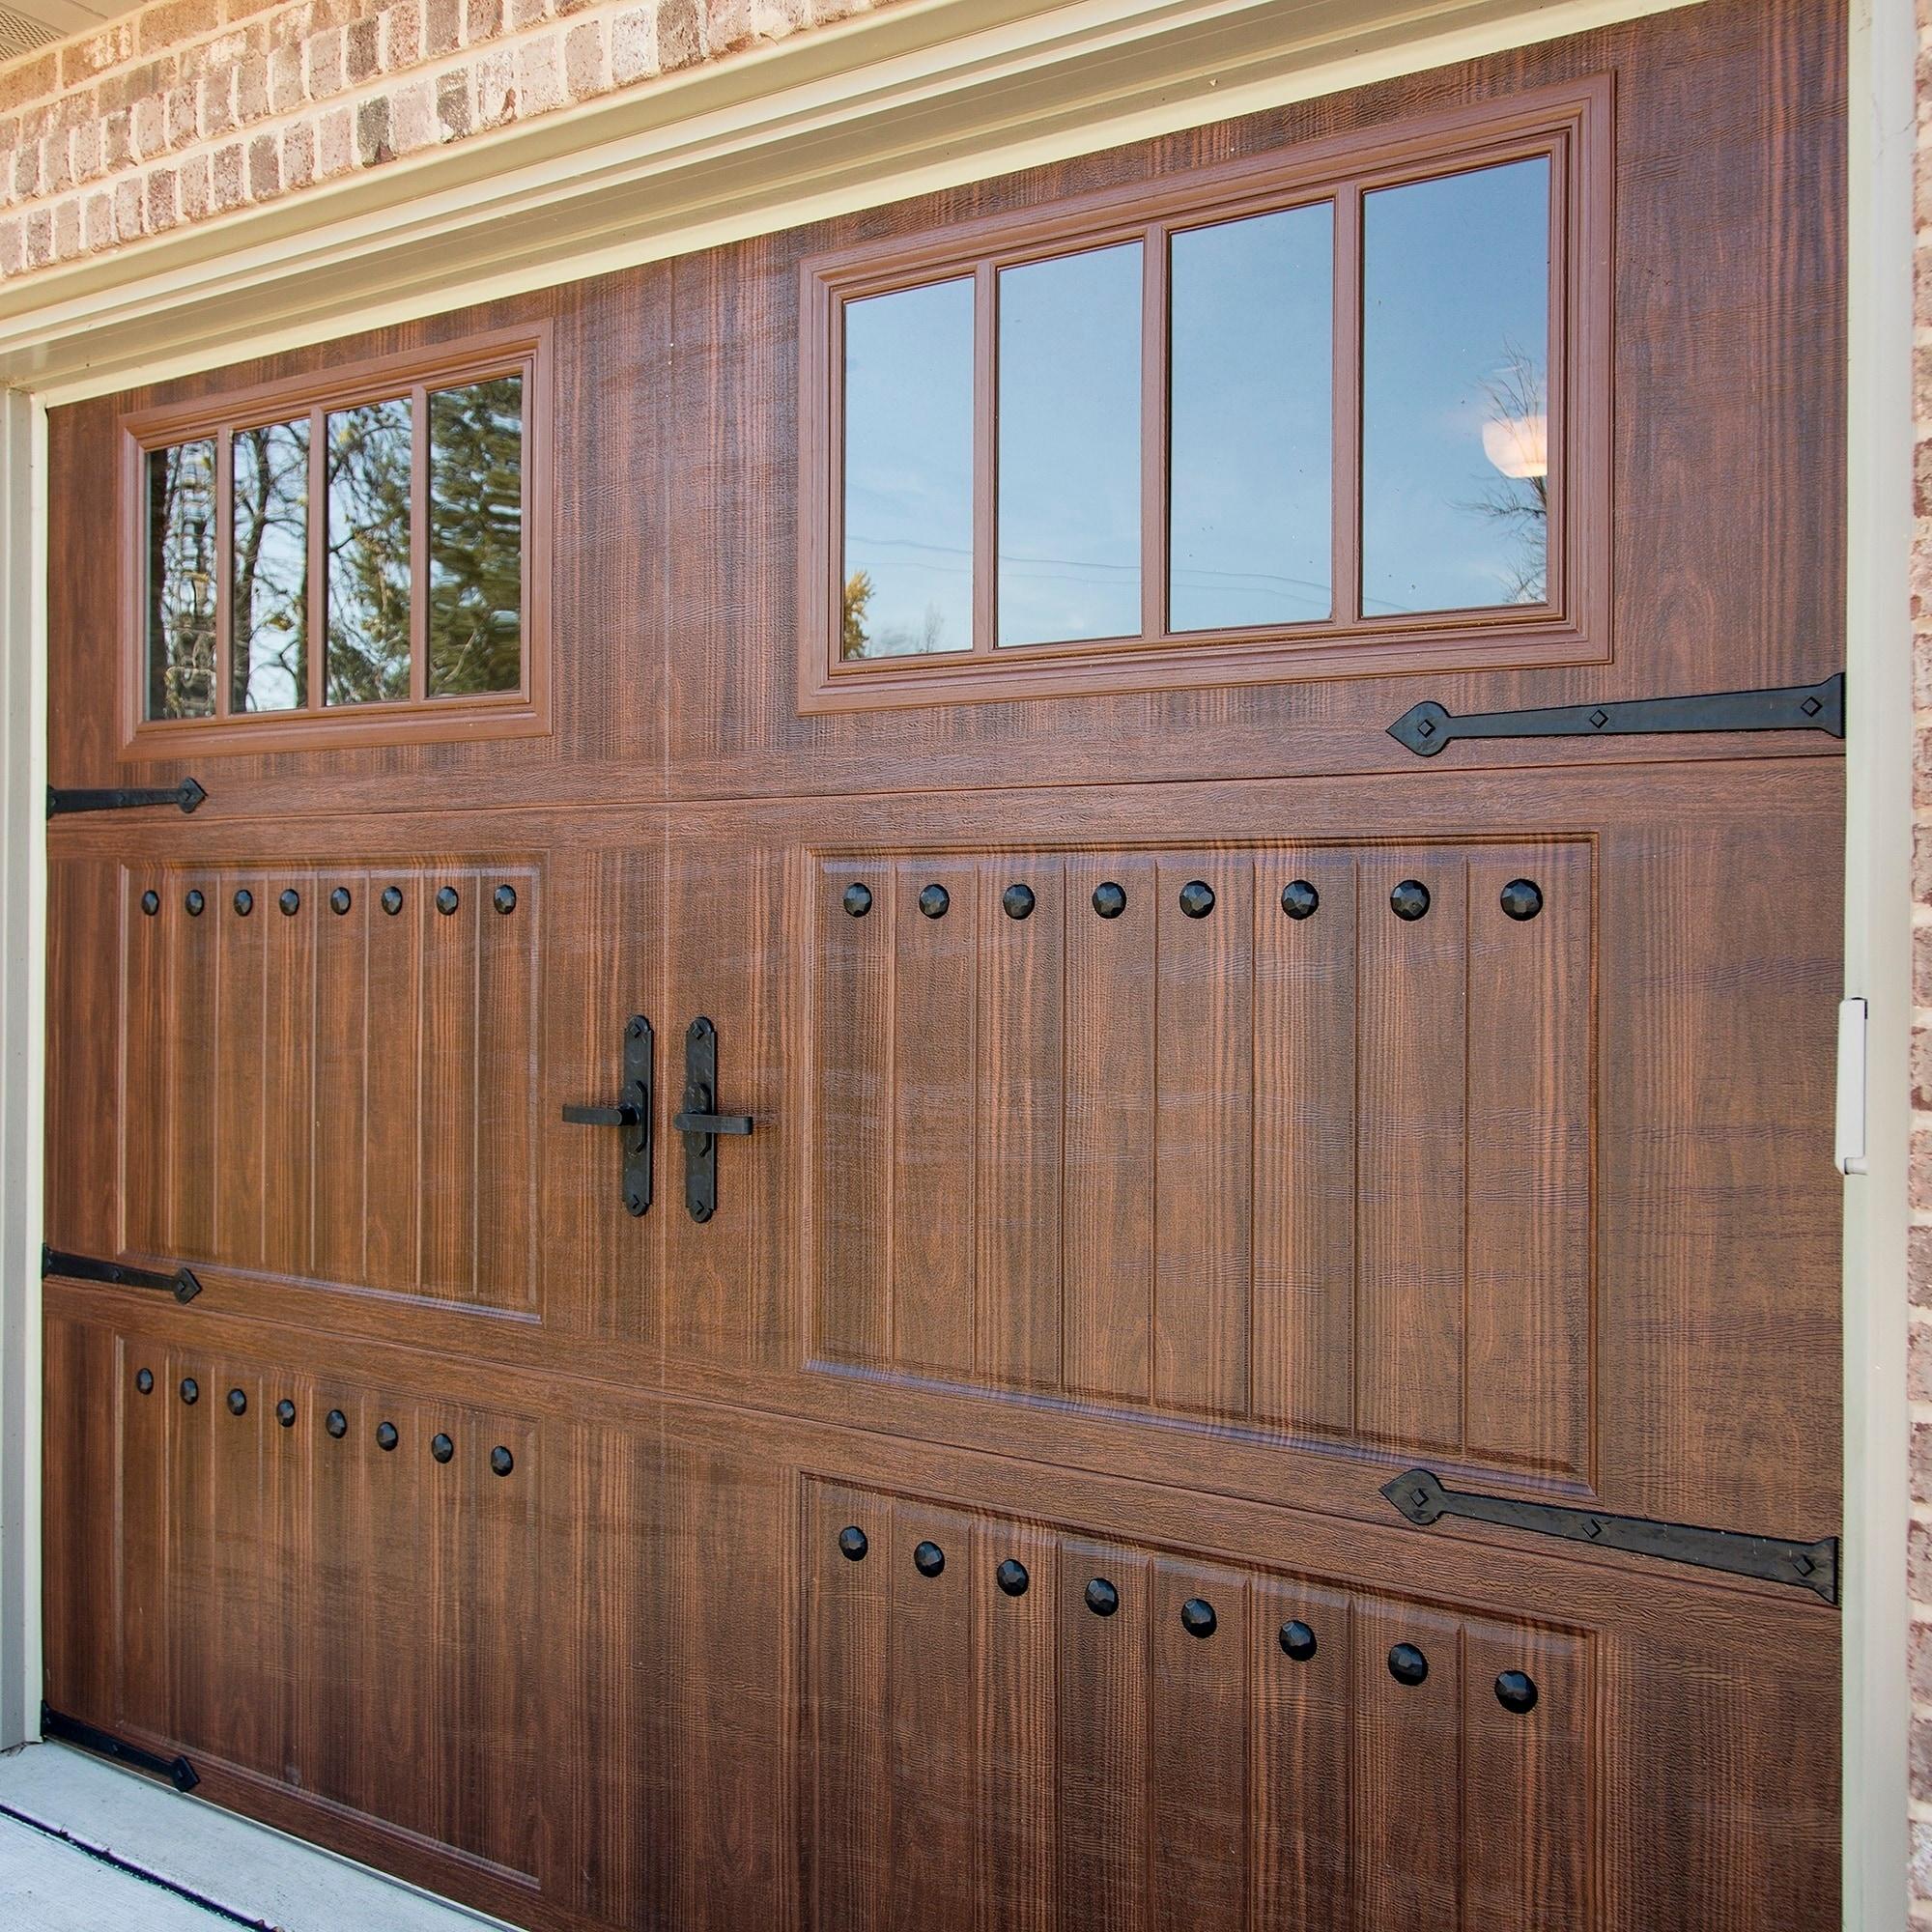 Door Clavos Amp Rustic Clavos U2013 Decorative Nailheads